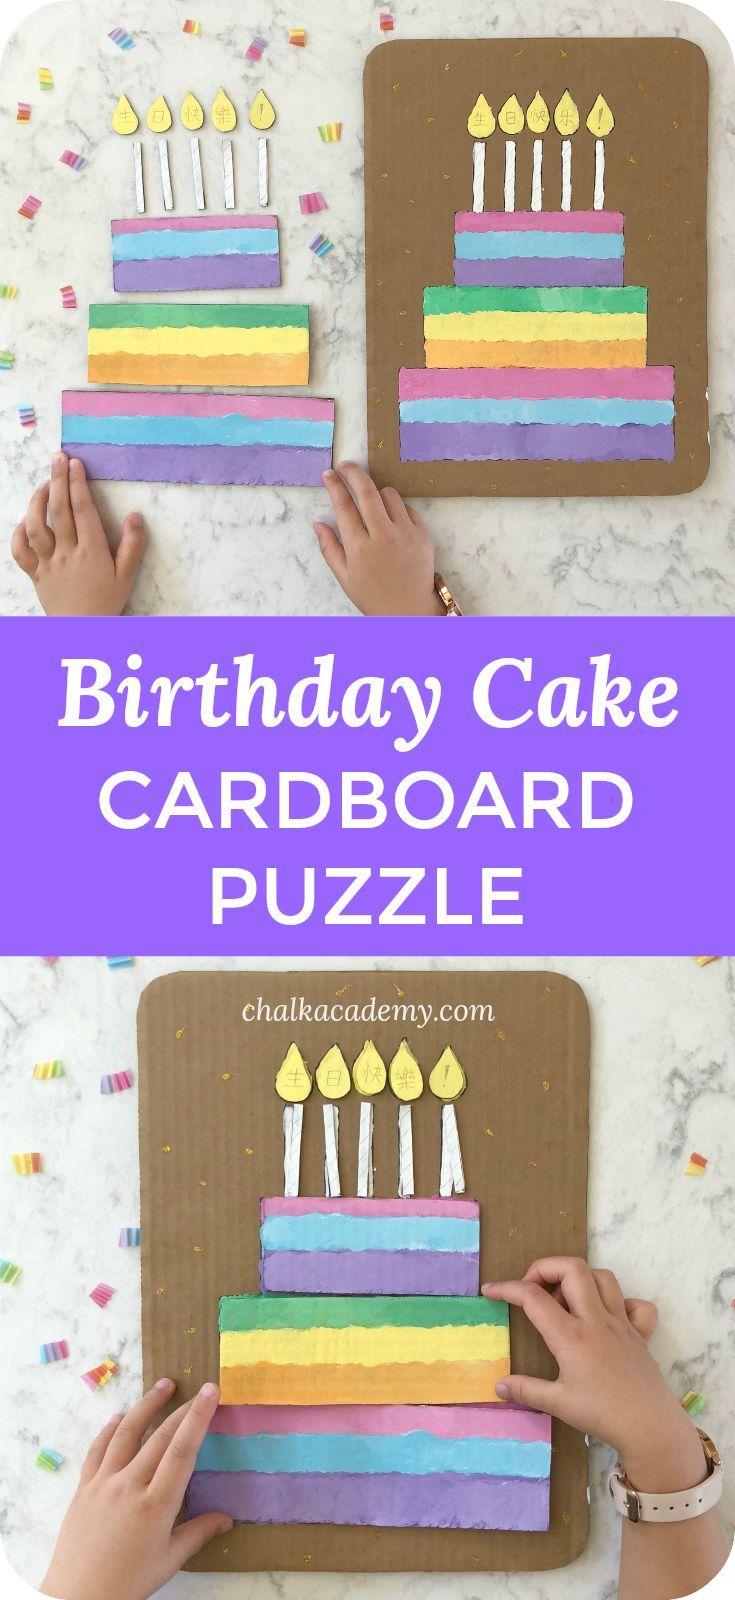 cardboard birthday cake puzzle craft  happy birthday